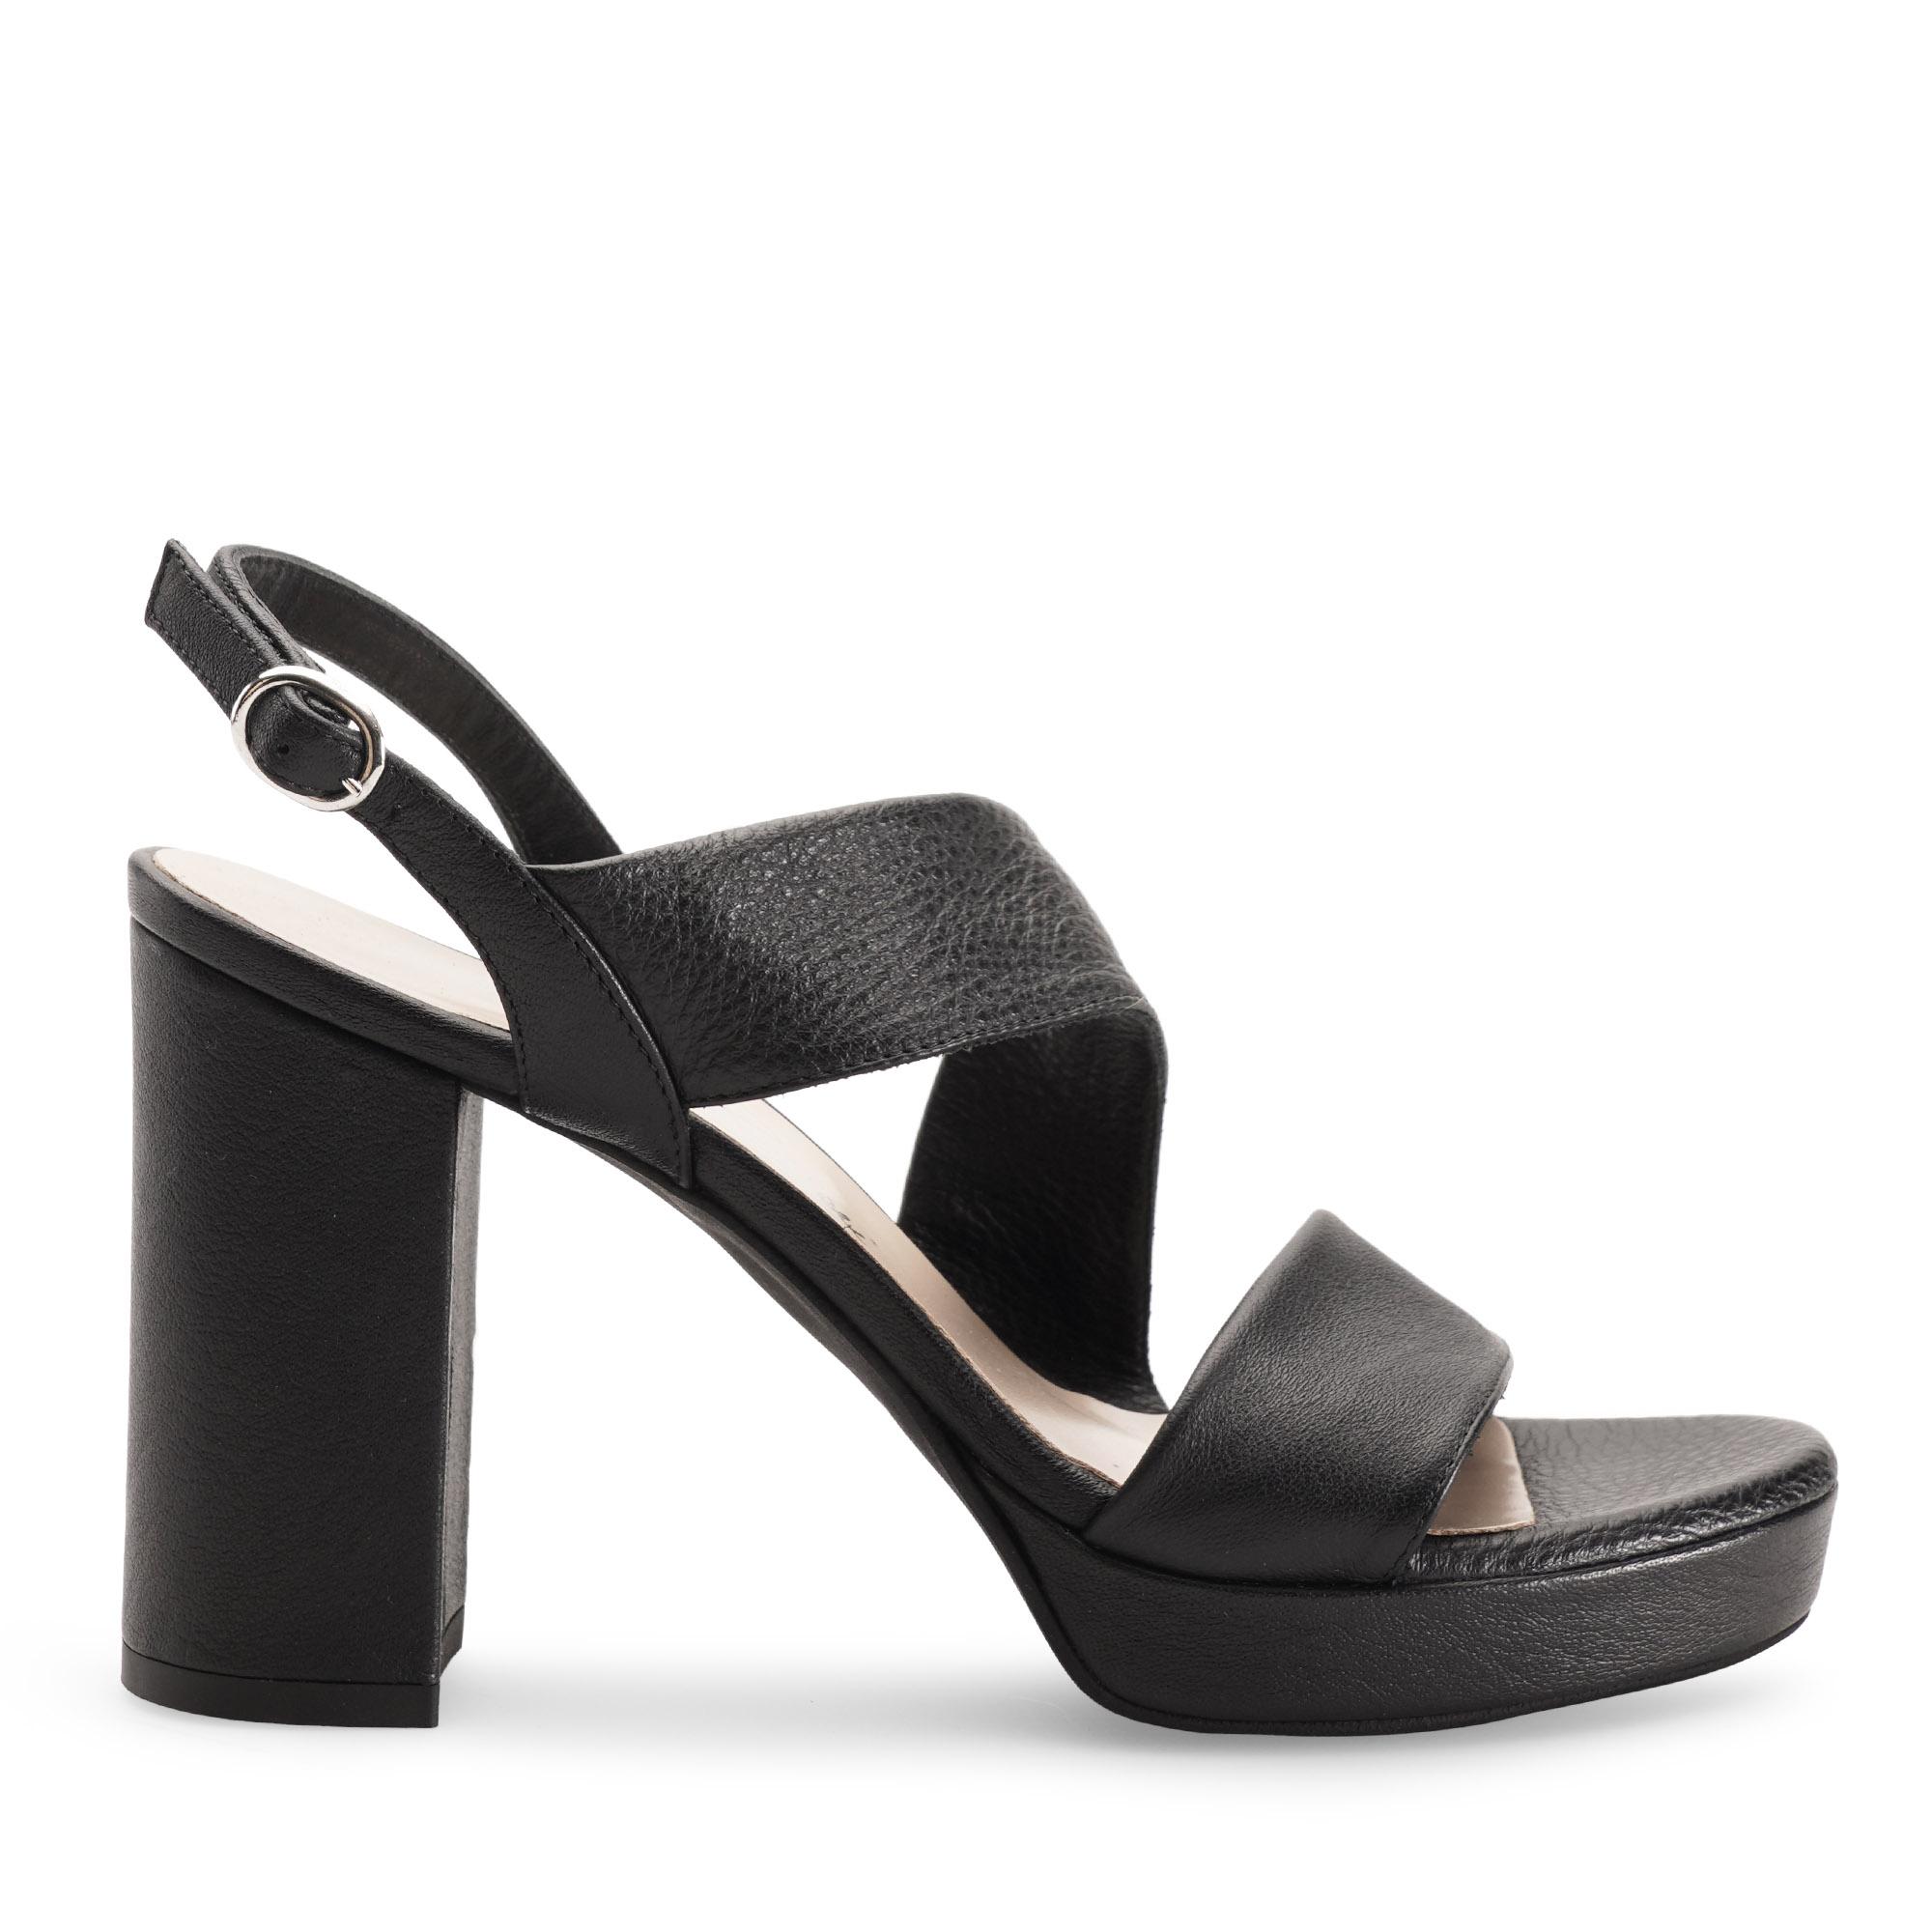 sandalo-nero-piantina-plateau-emanuela-passeri-nero-heels-shoes-spring-summer-2021